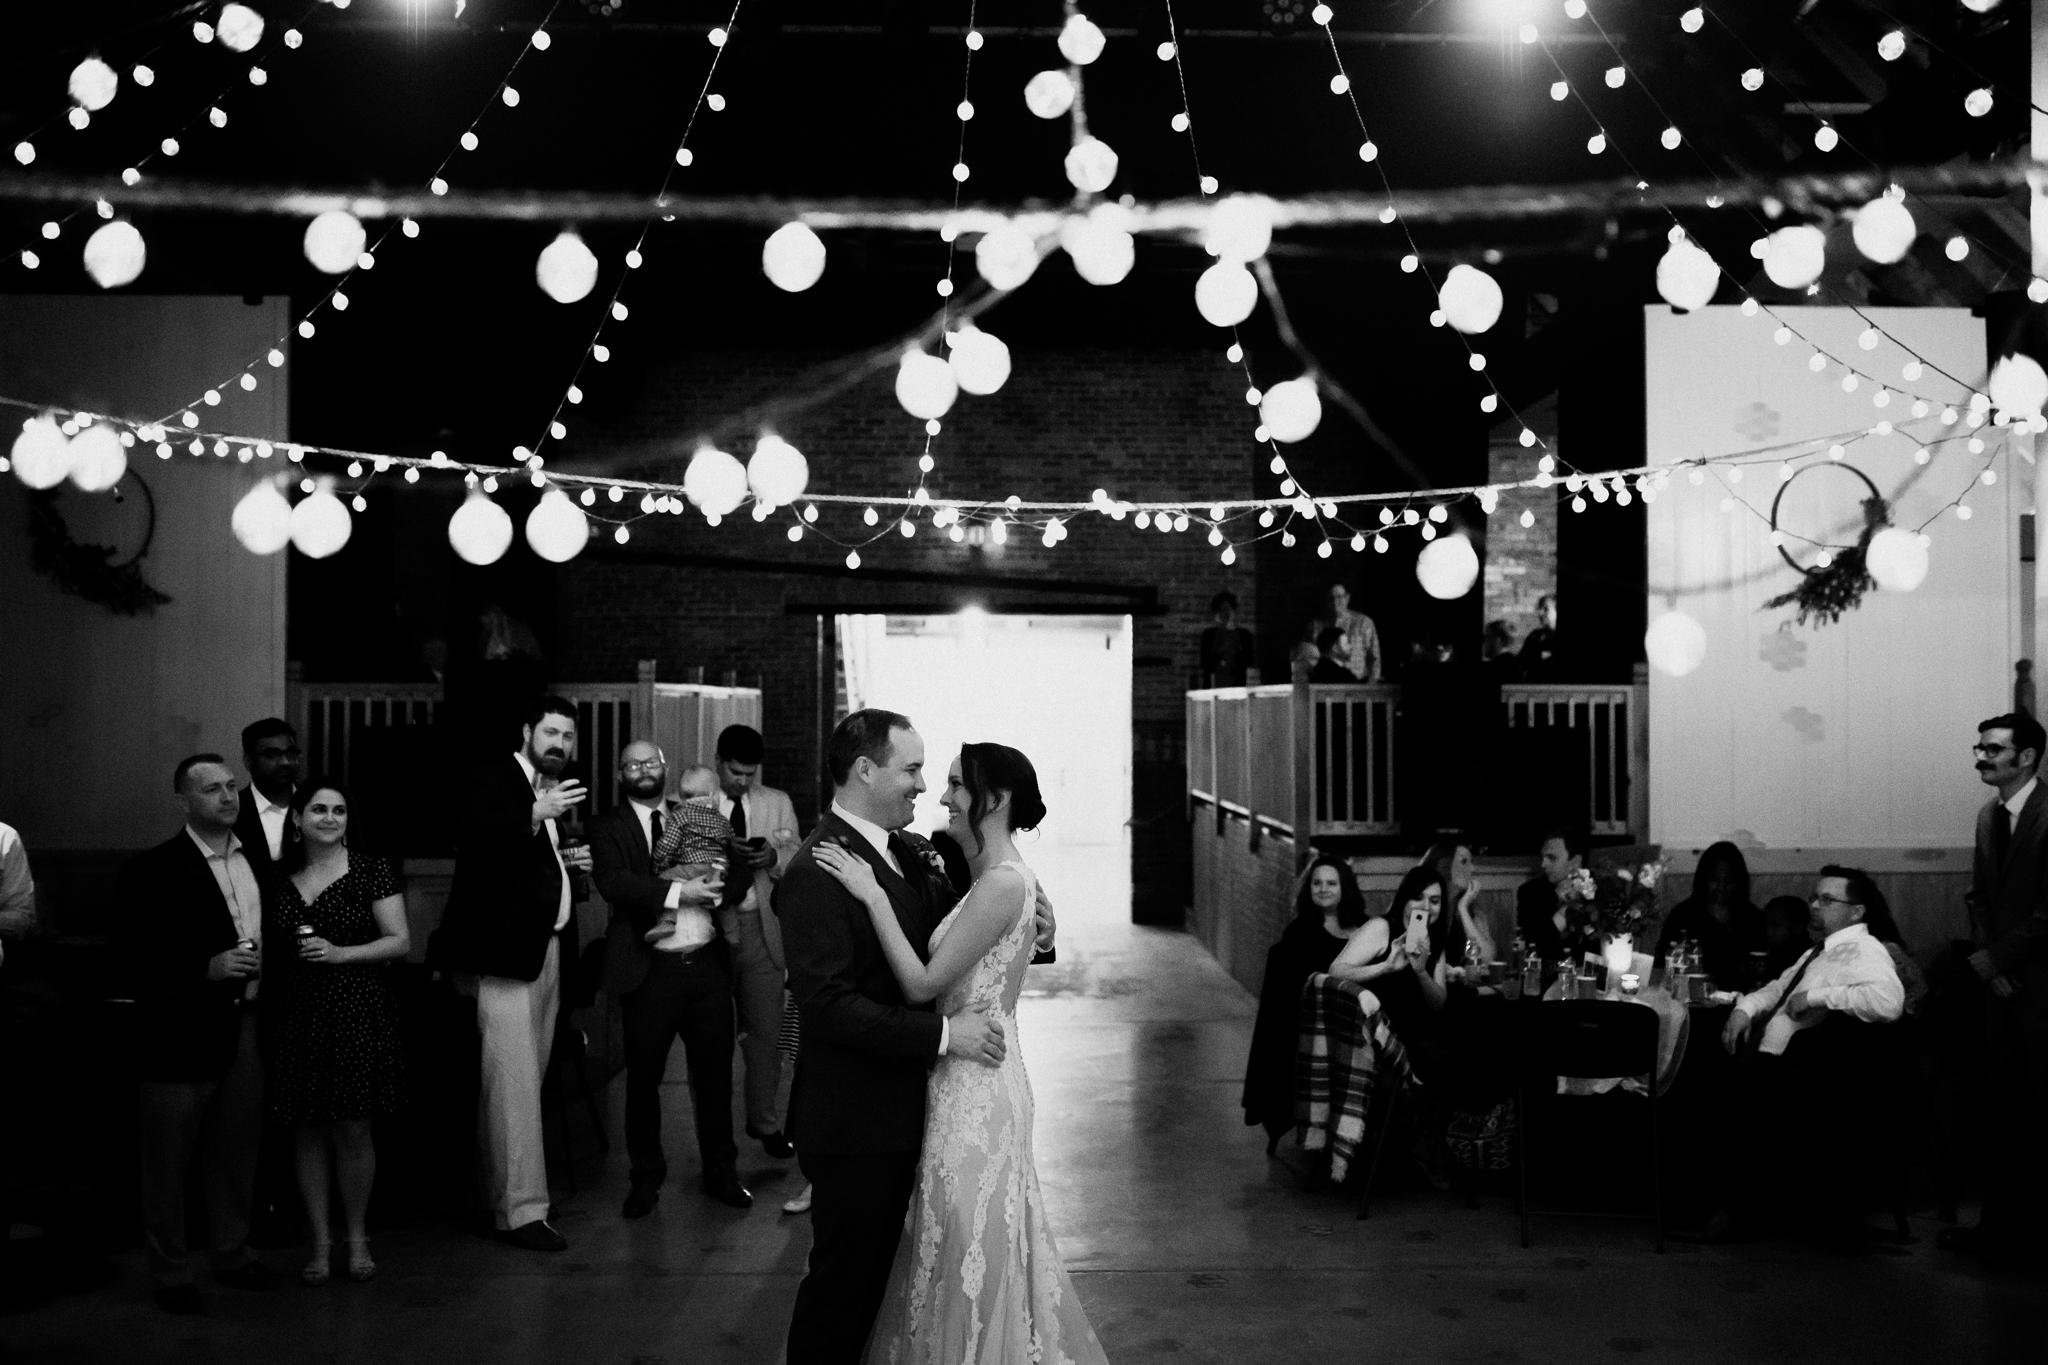 birmingham-alabama-wedding-photographer-laura-terry-the-warmth-around-you (87 of 110).jpg